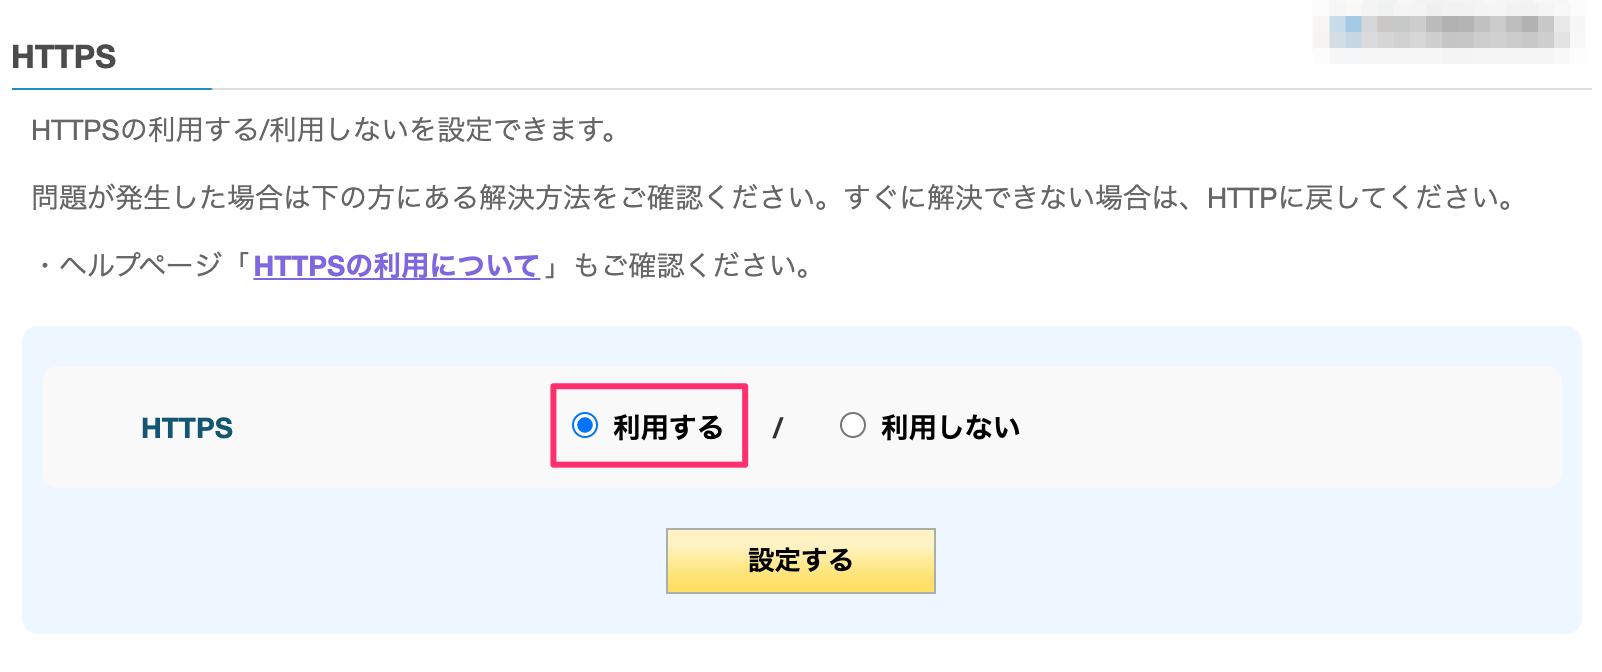 HTTPSの利用設定